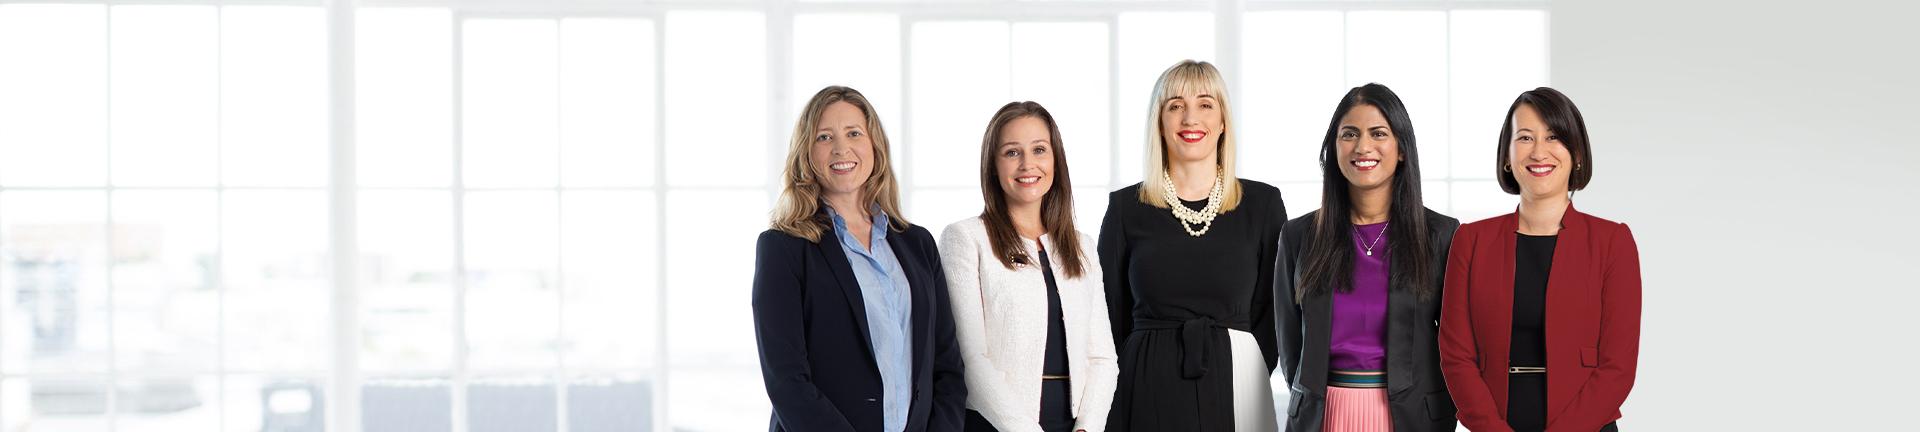 Women-in-Business-Law-Awards-2021